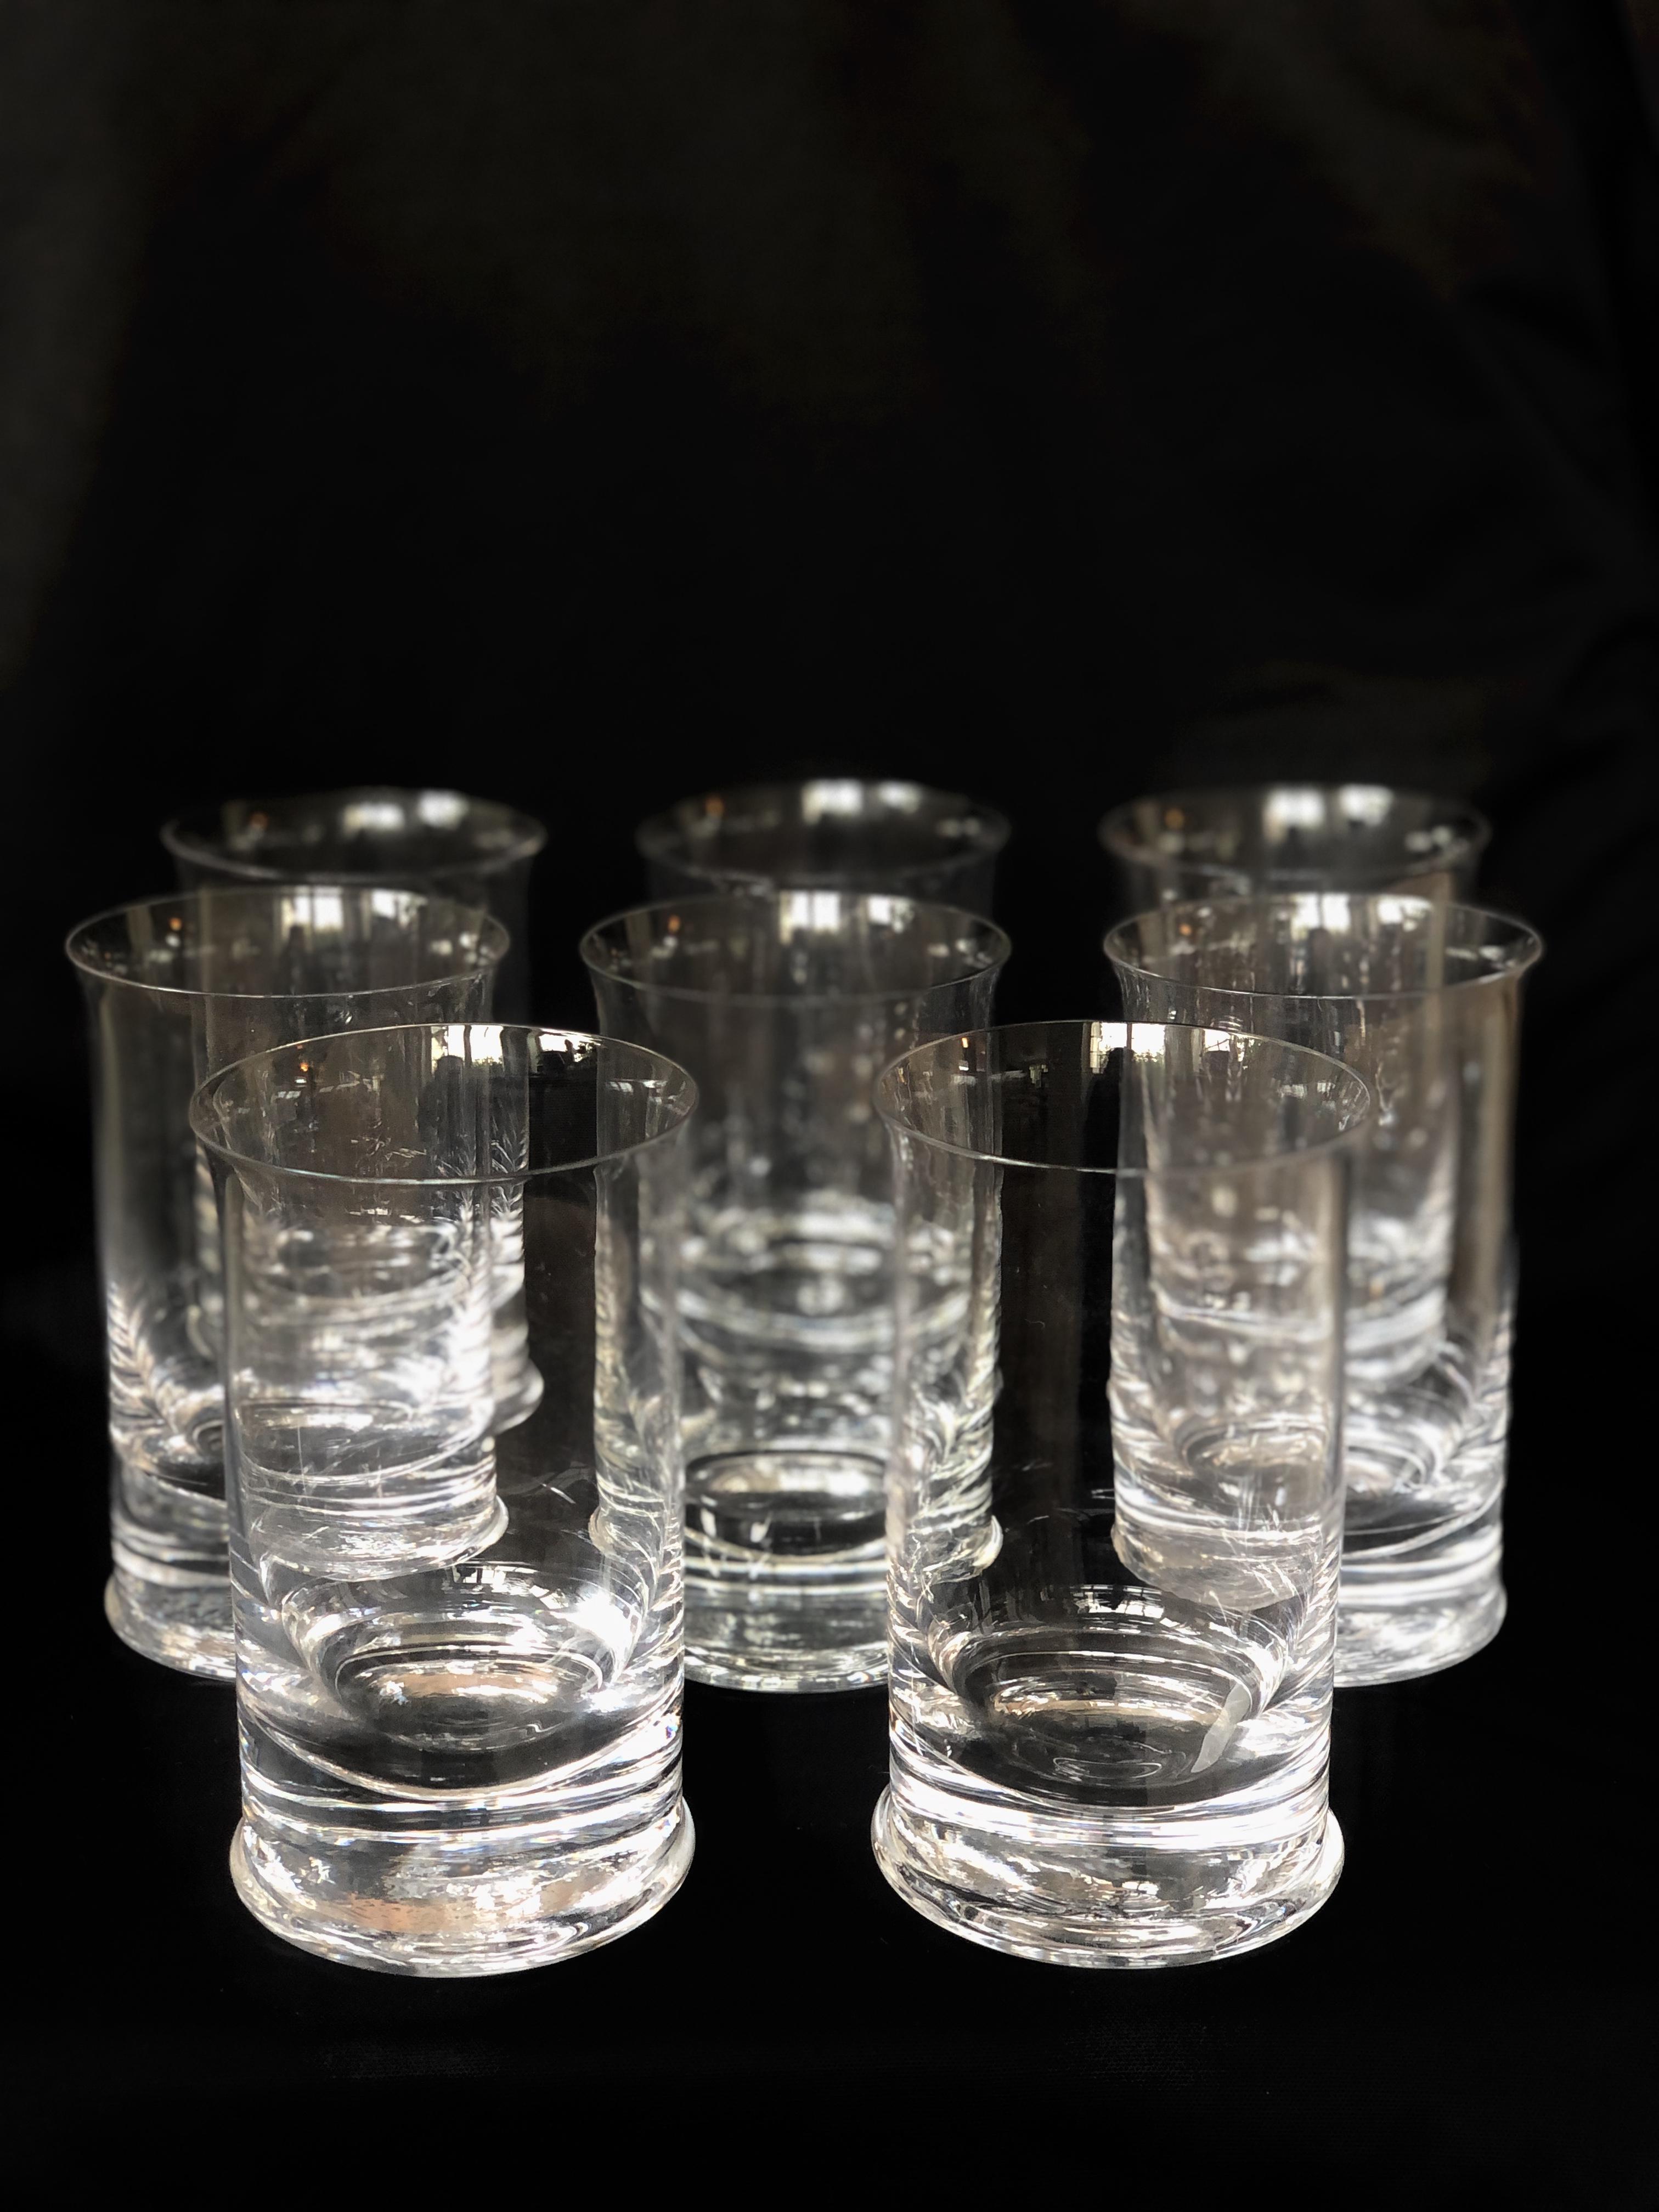 Ölglas (8)